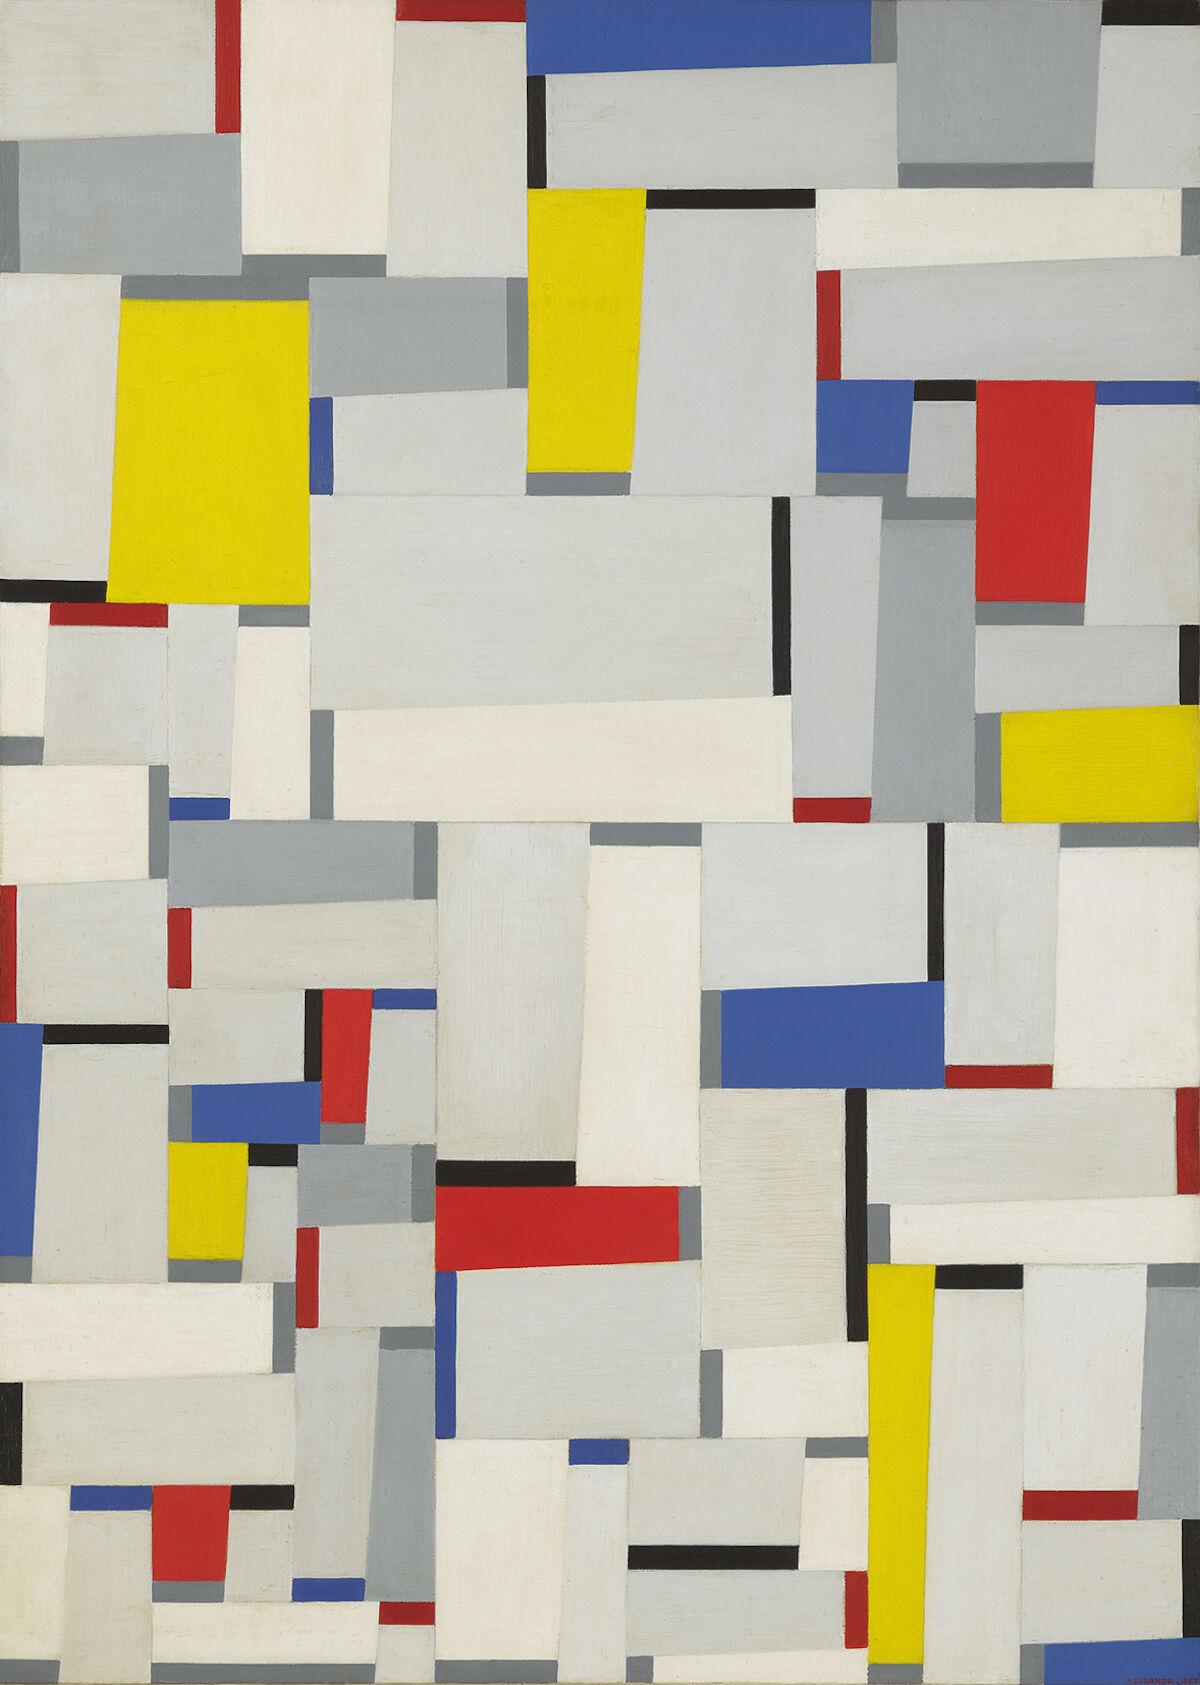 Fritz Glarner, Relational Painting No. 60, 1952. Courtesy Sotheby's.